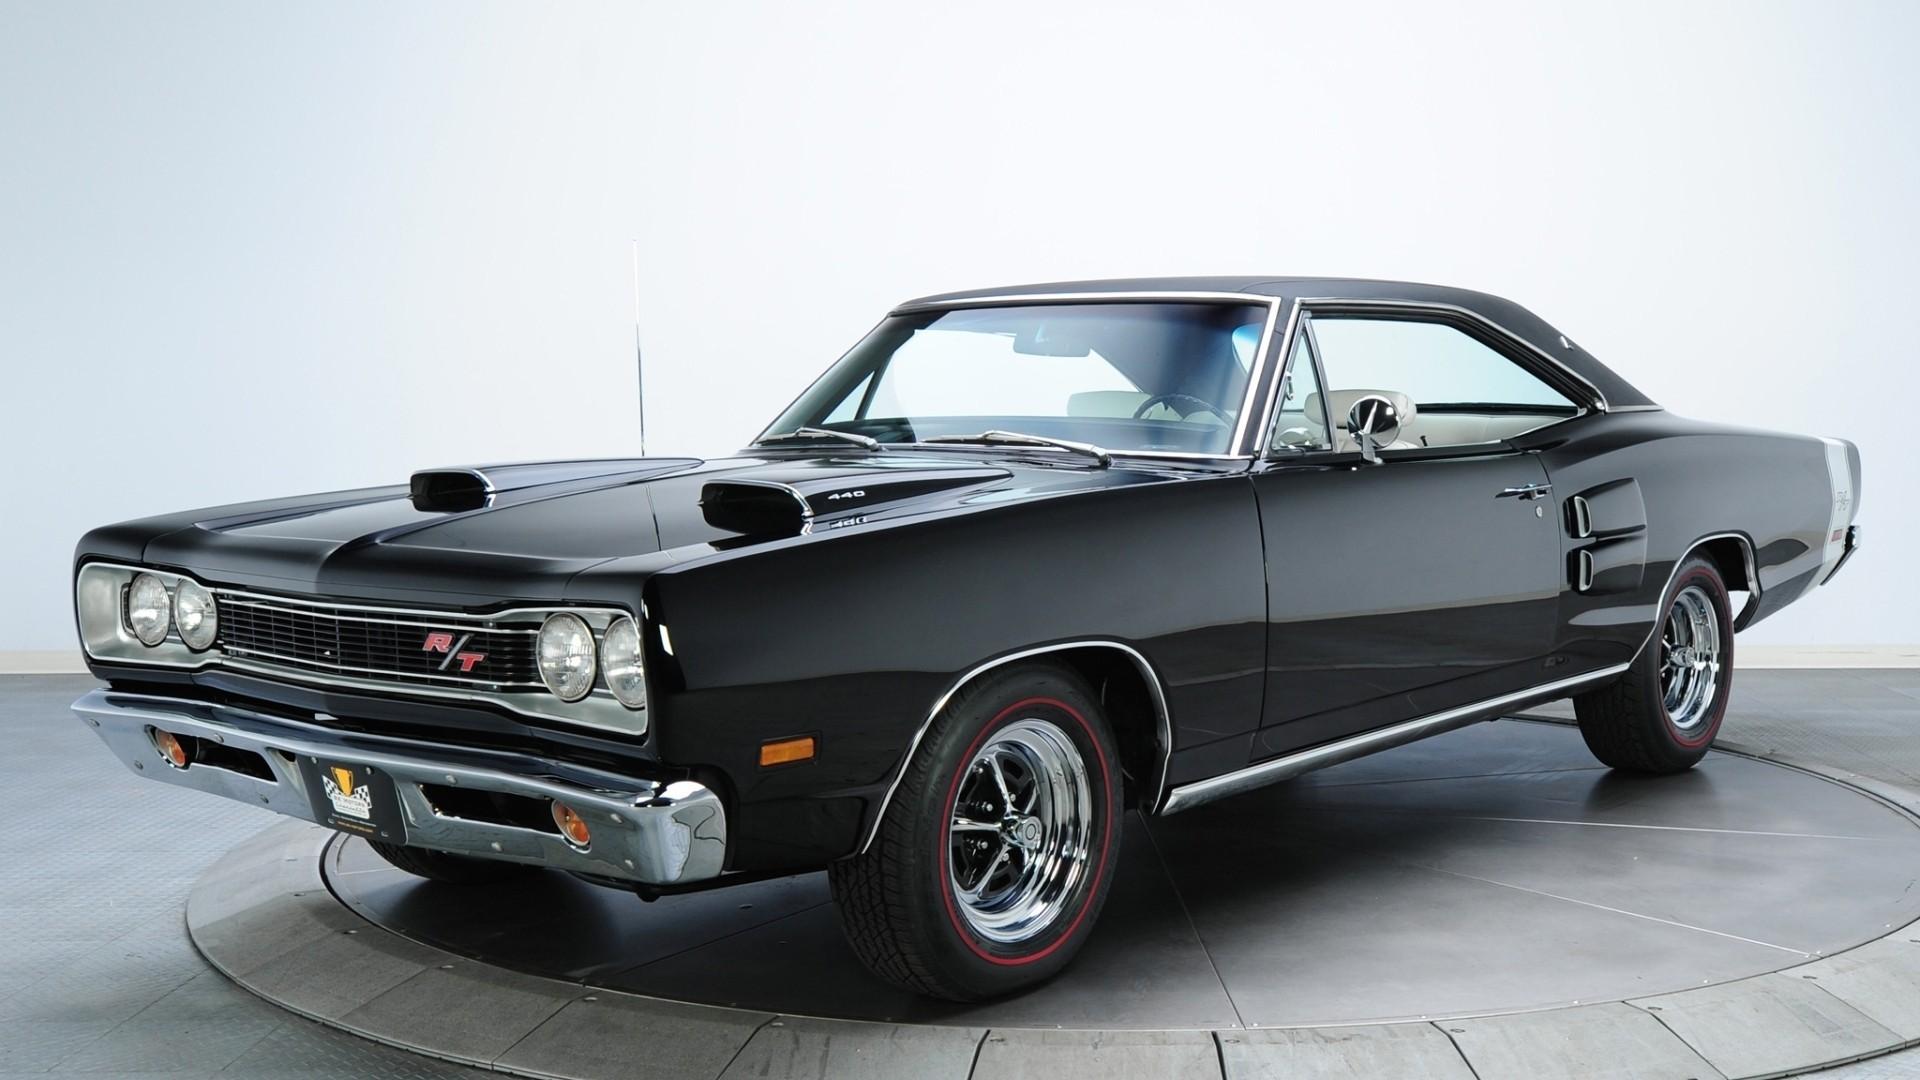 com categories cars tags 1080i 1920 x 1080 black vintage vintage cars 1920x1080